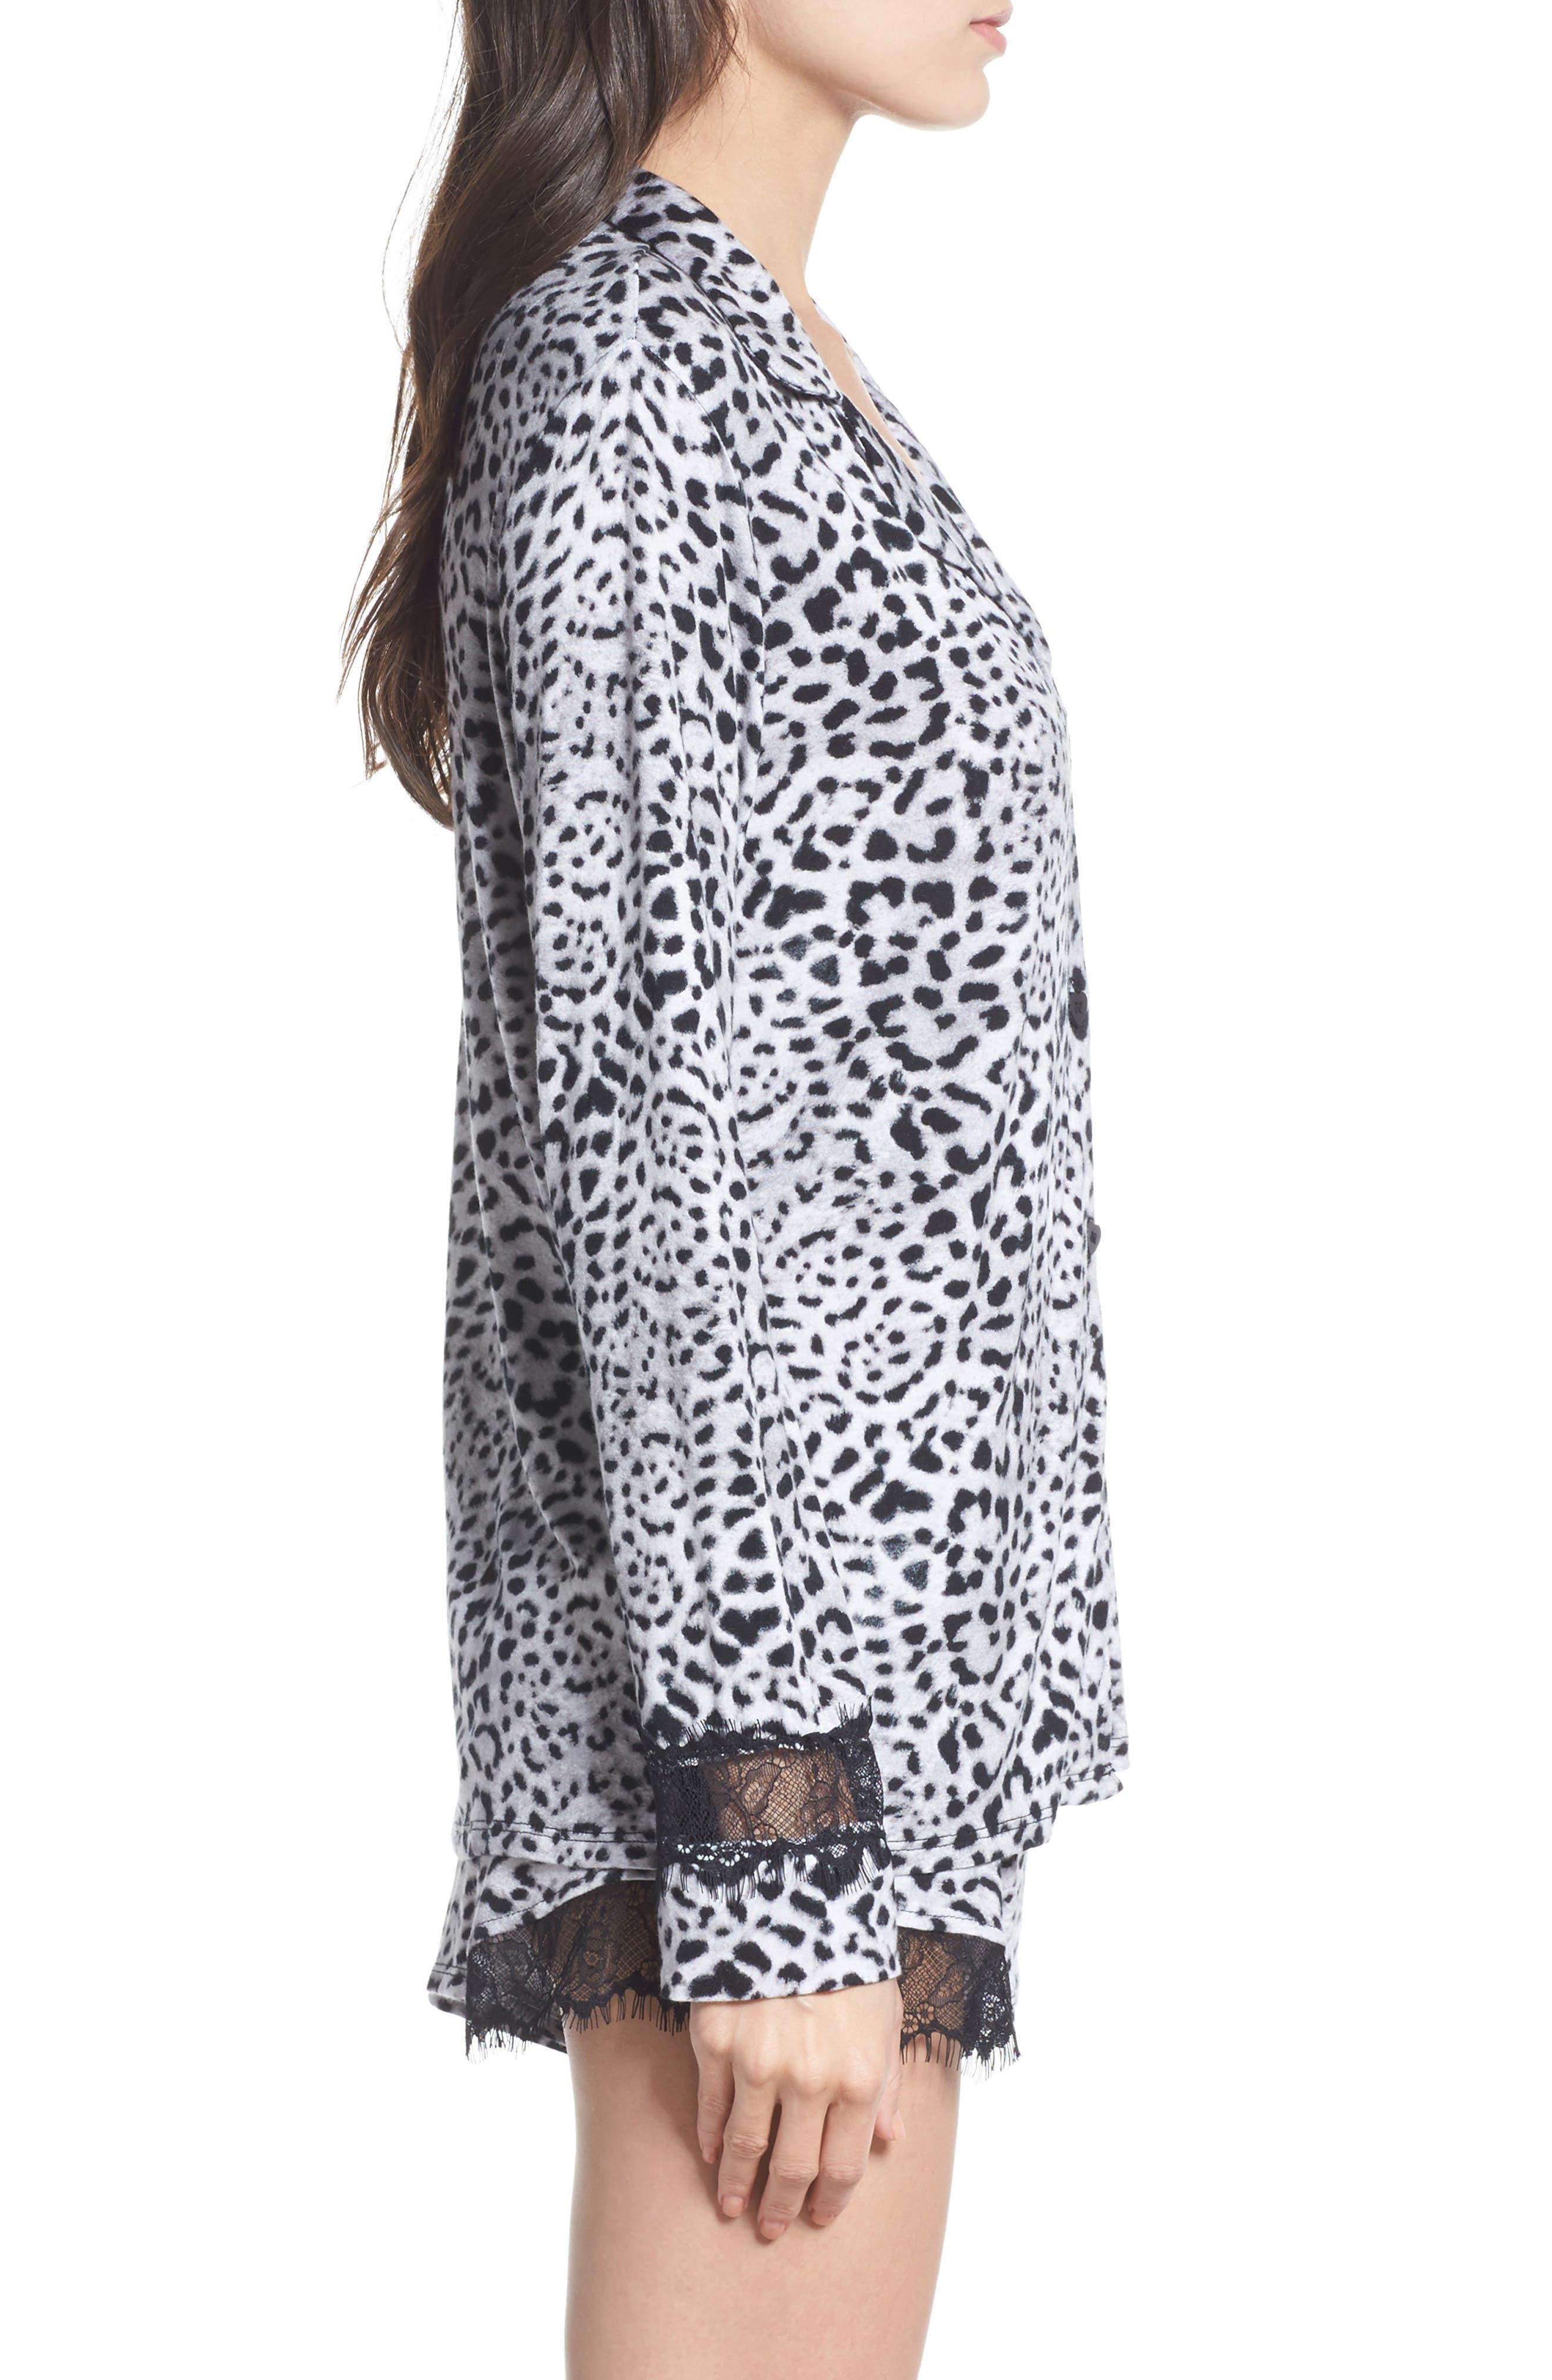 Notch Collar Short Pajamas,                             Alternate thumbnail 3, color,                             Silky Leopard Grey